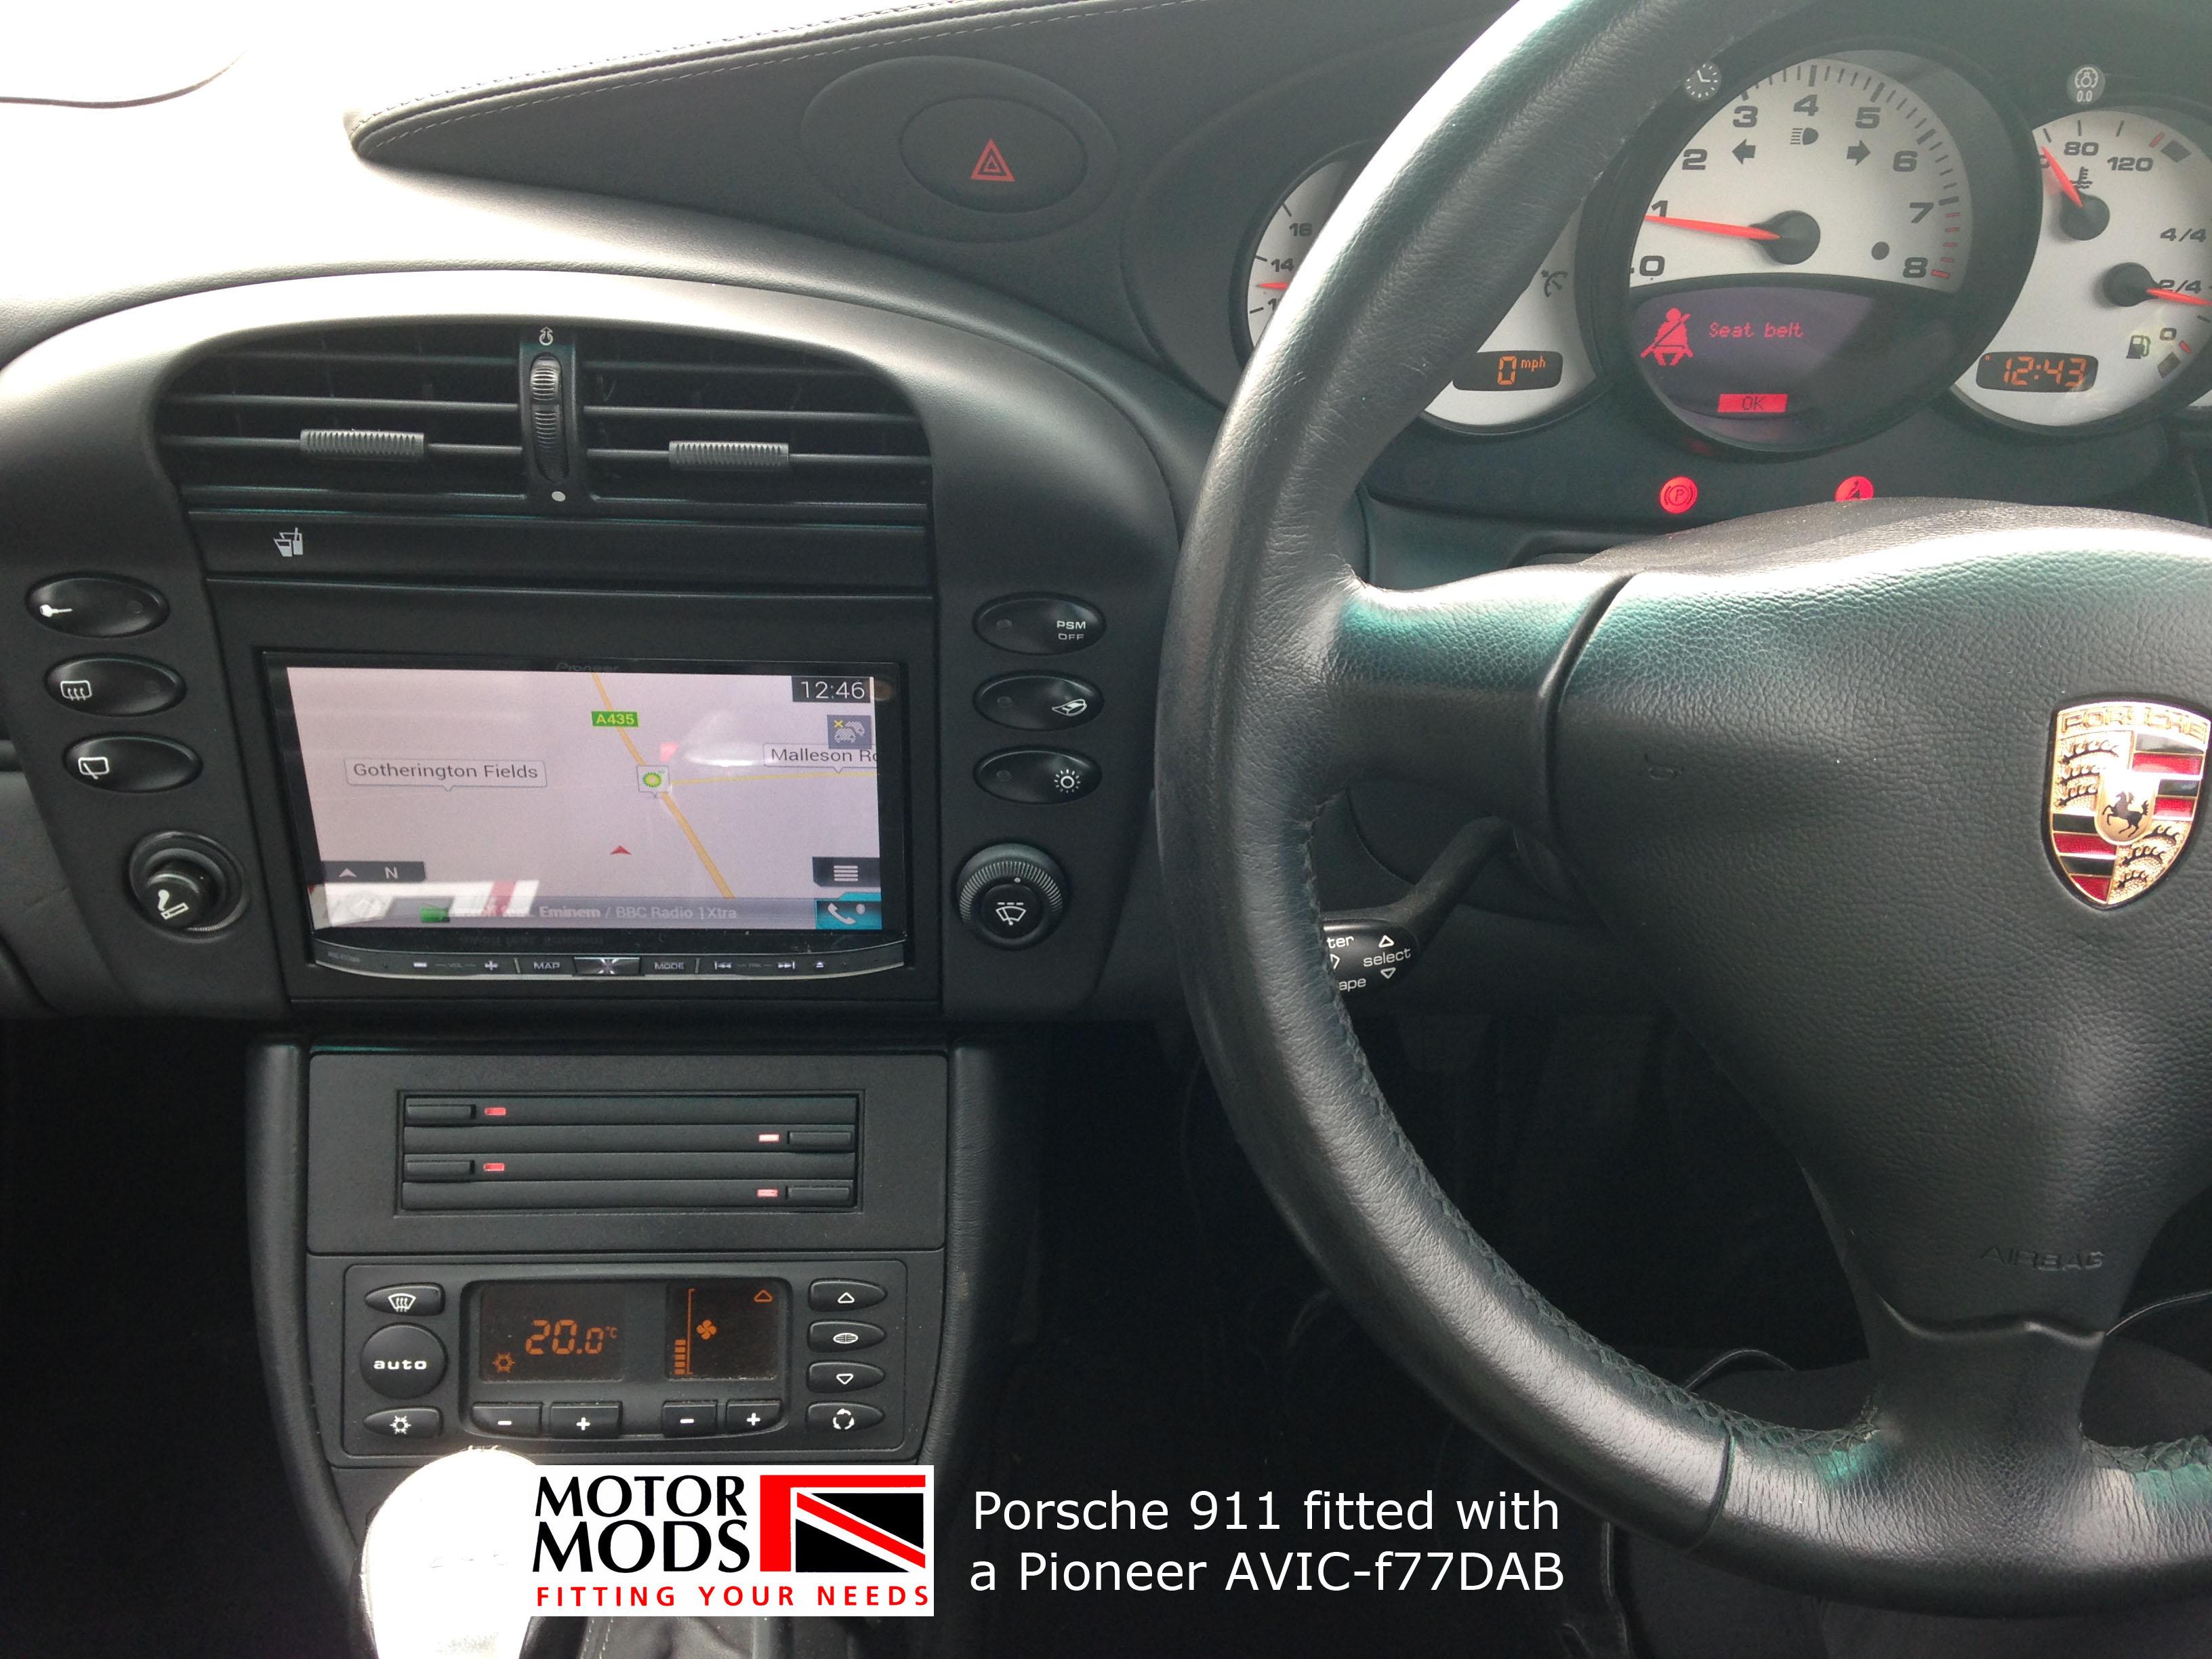 Motor Mods Gloucestershire Uk Car Satellite Navigation Systems Peugeot 308 Towbar Wiring In